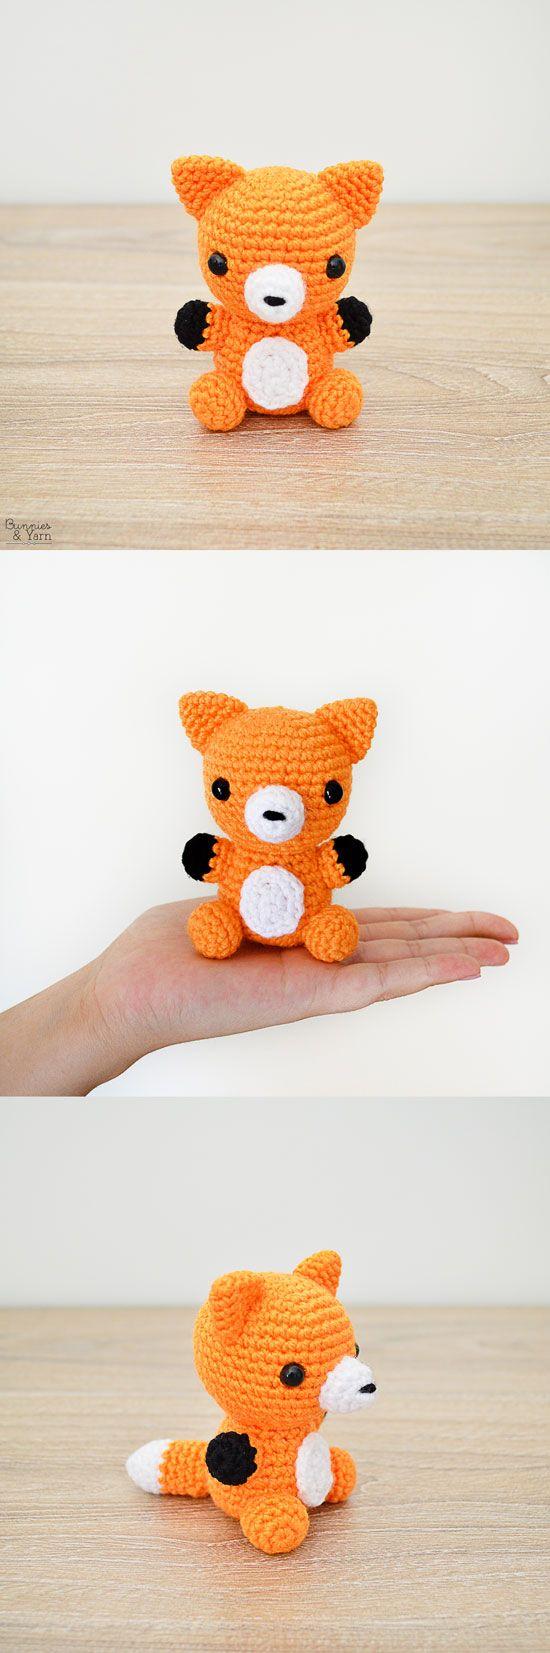 113 best Bunnies & Yarn images on Pinterest